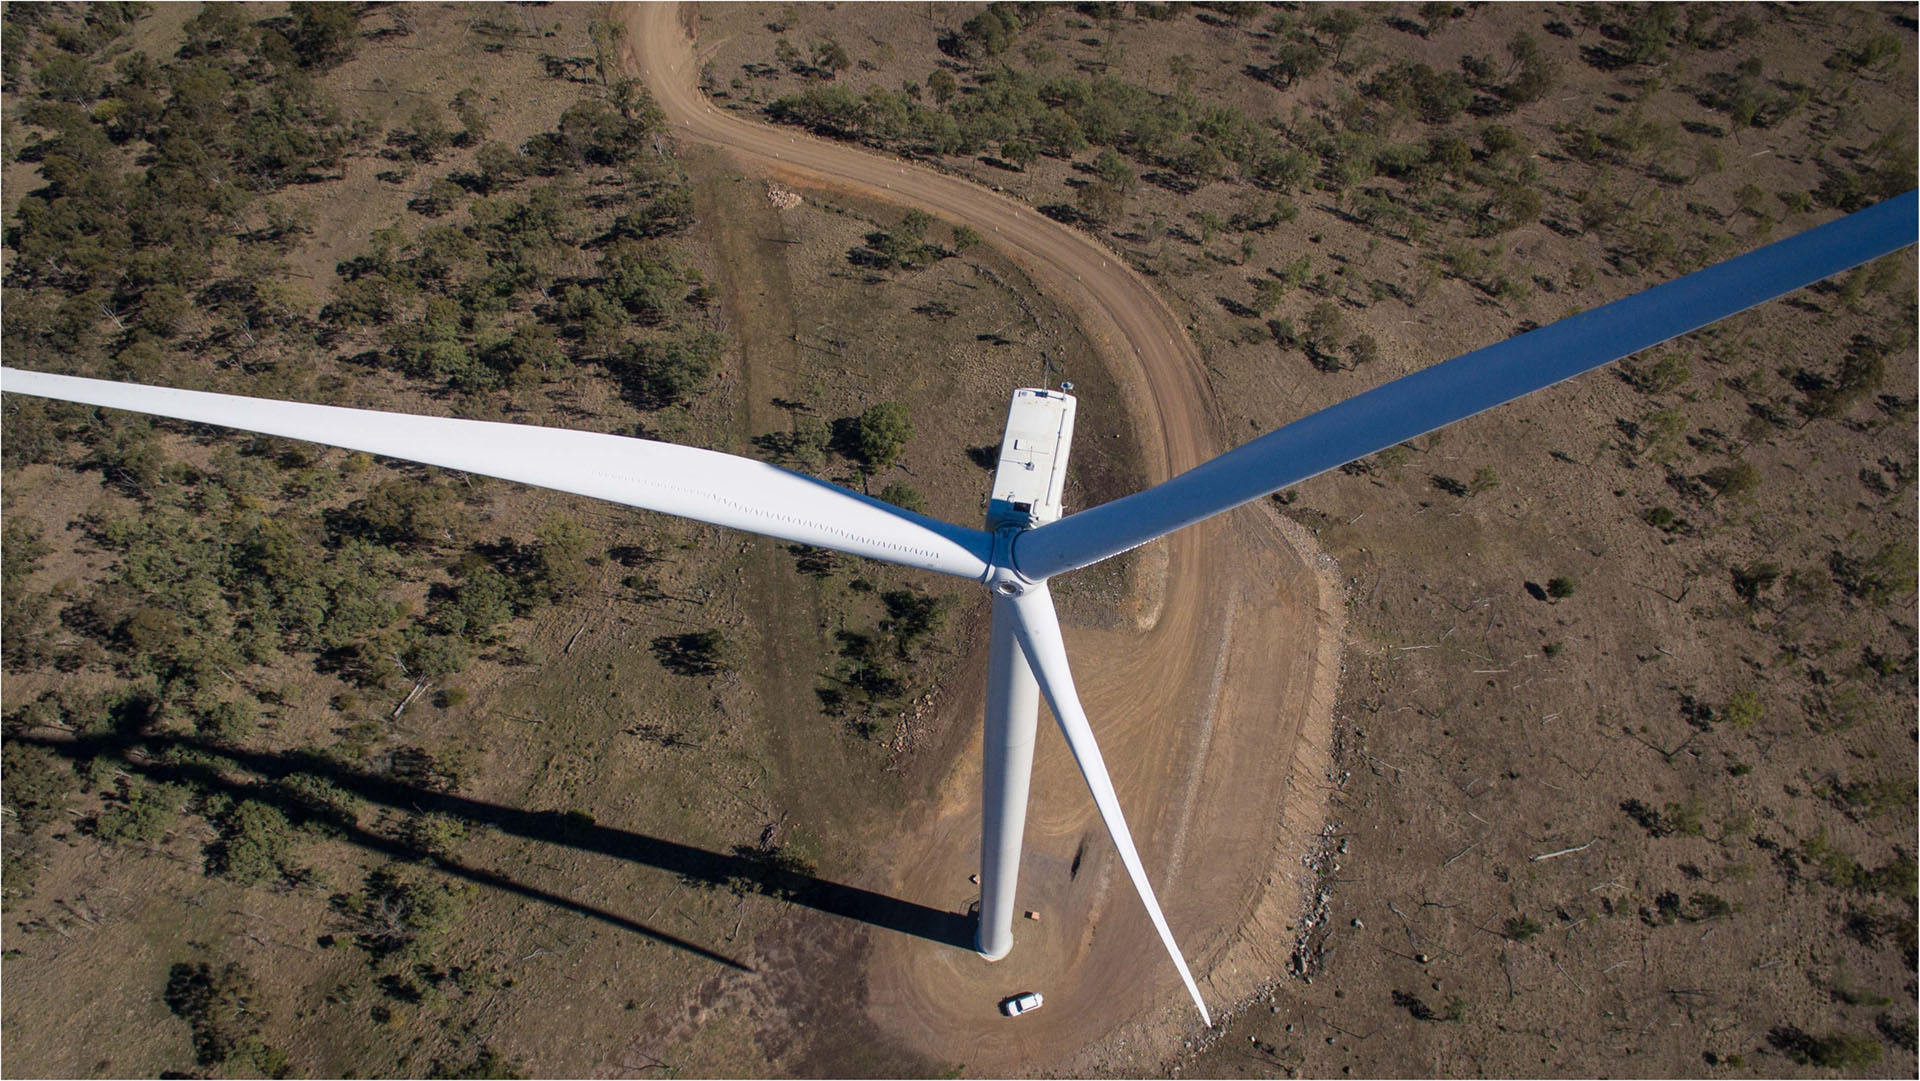 Coopers Gap Wind Farm